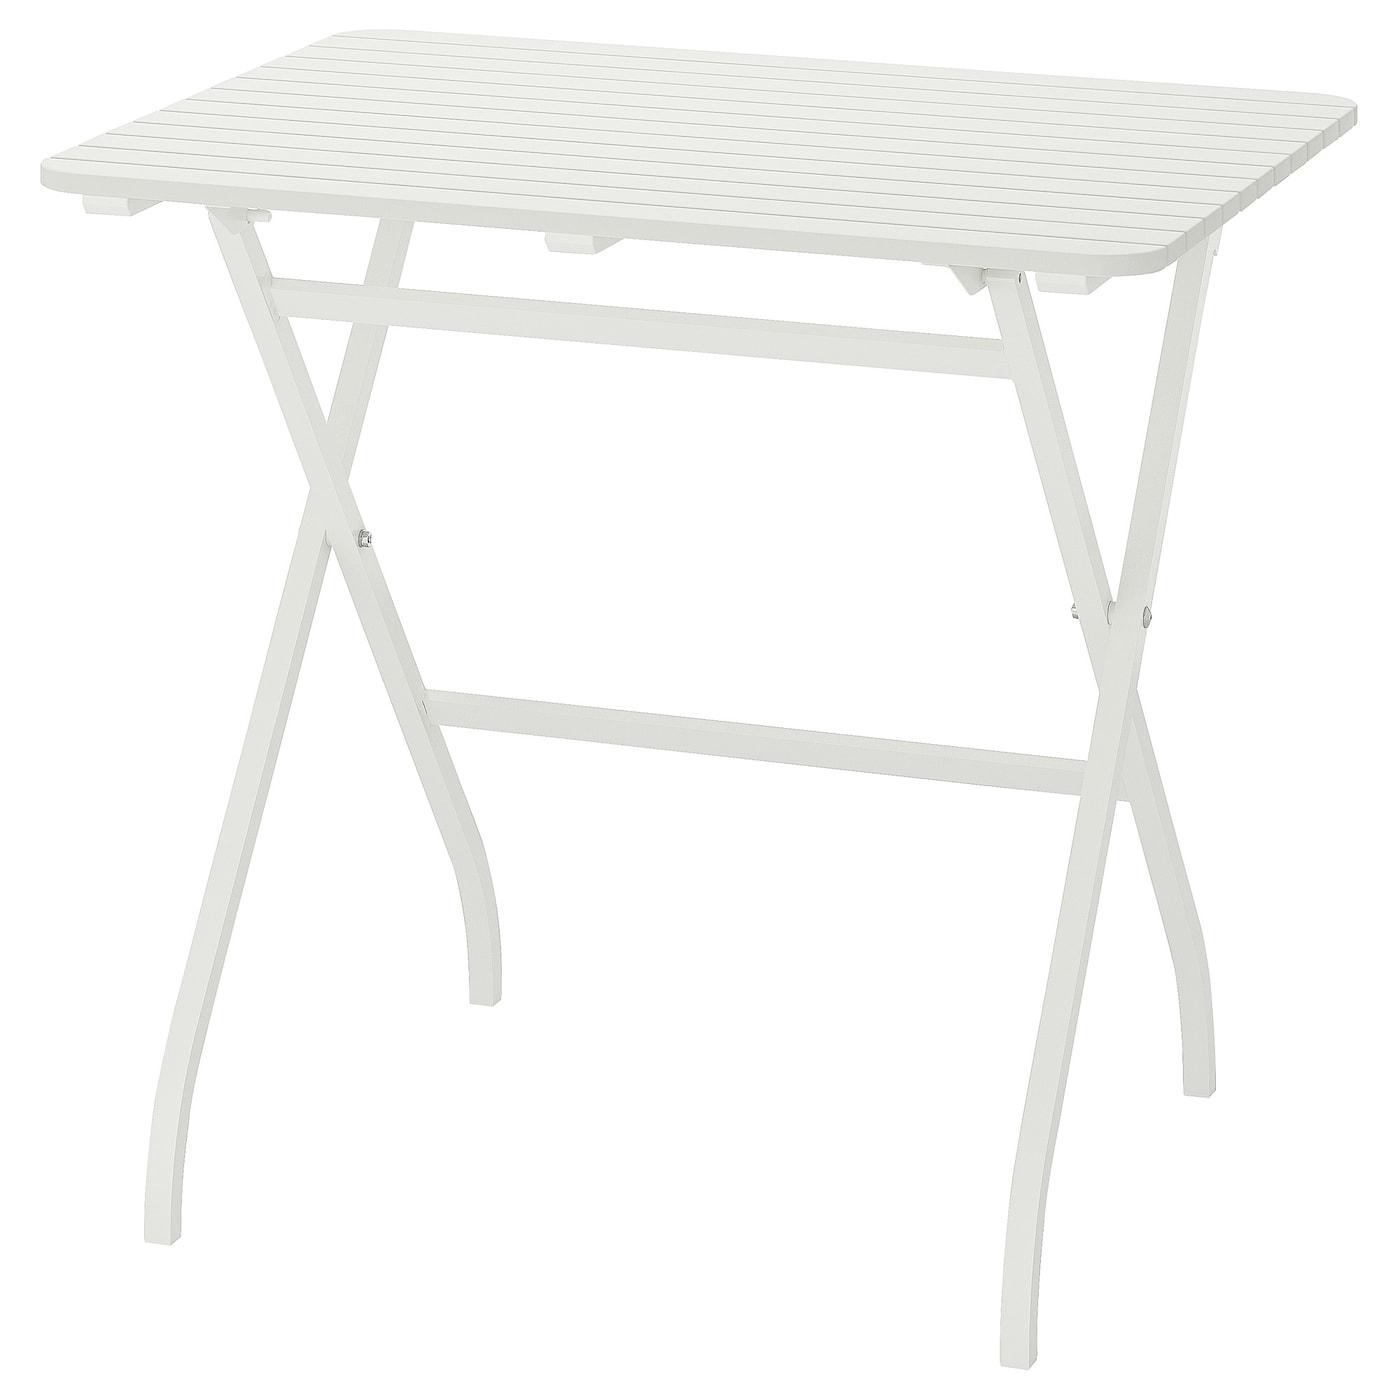 Malaro Table Outdoor Foldable White 80x62 Cm Ikea